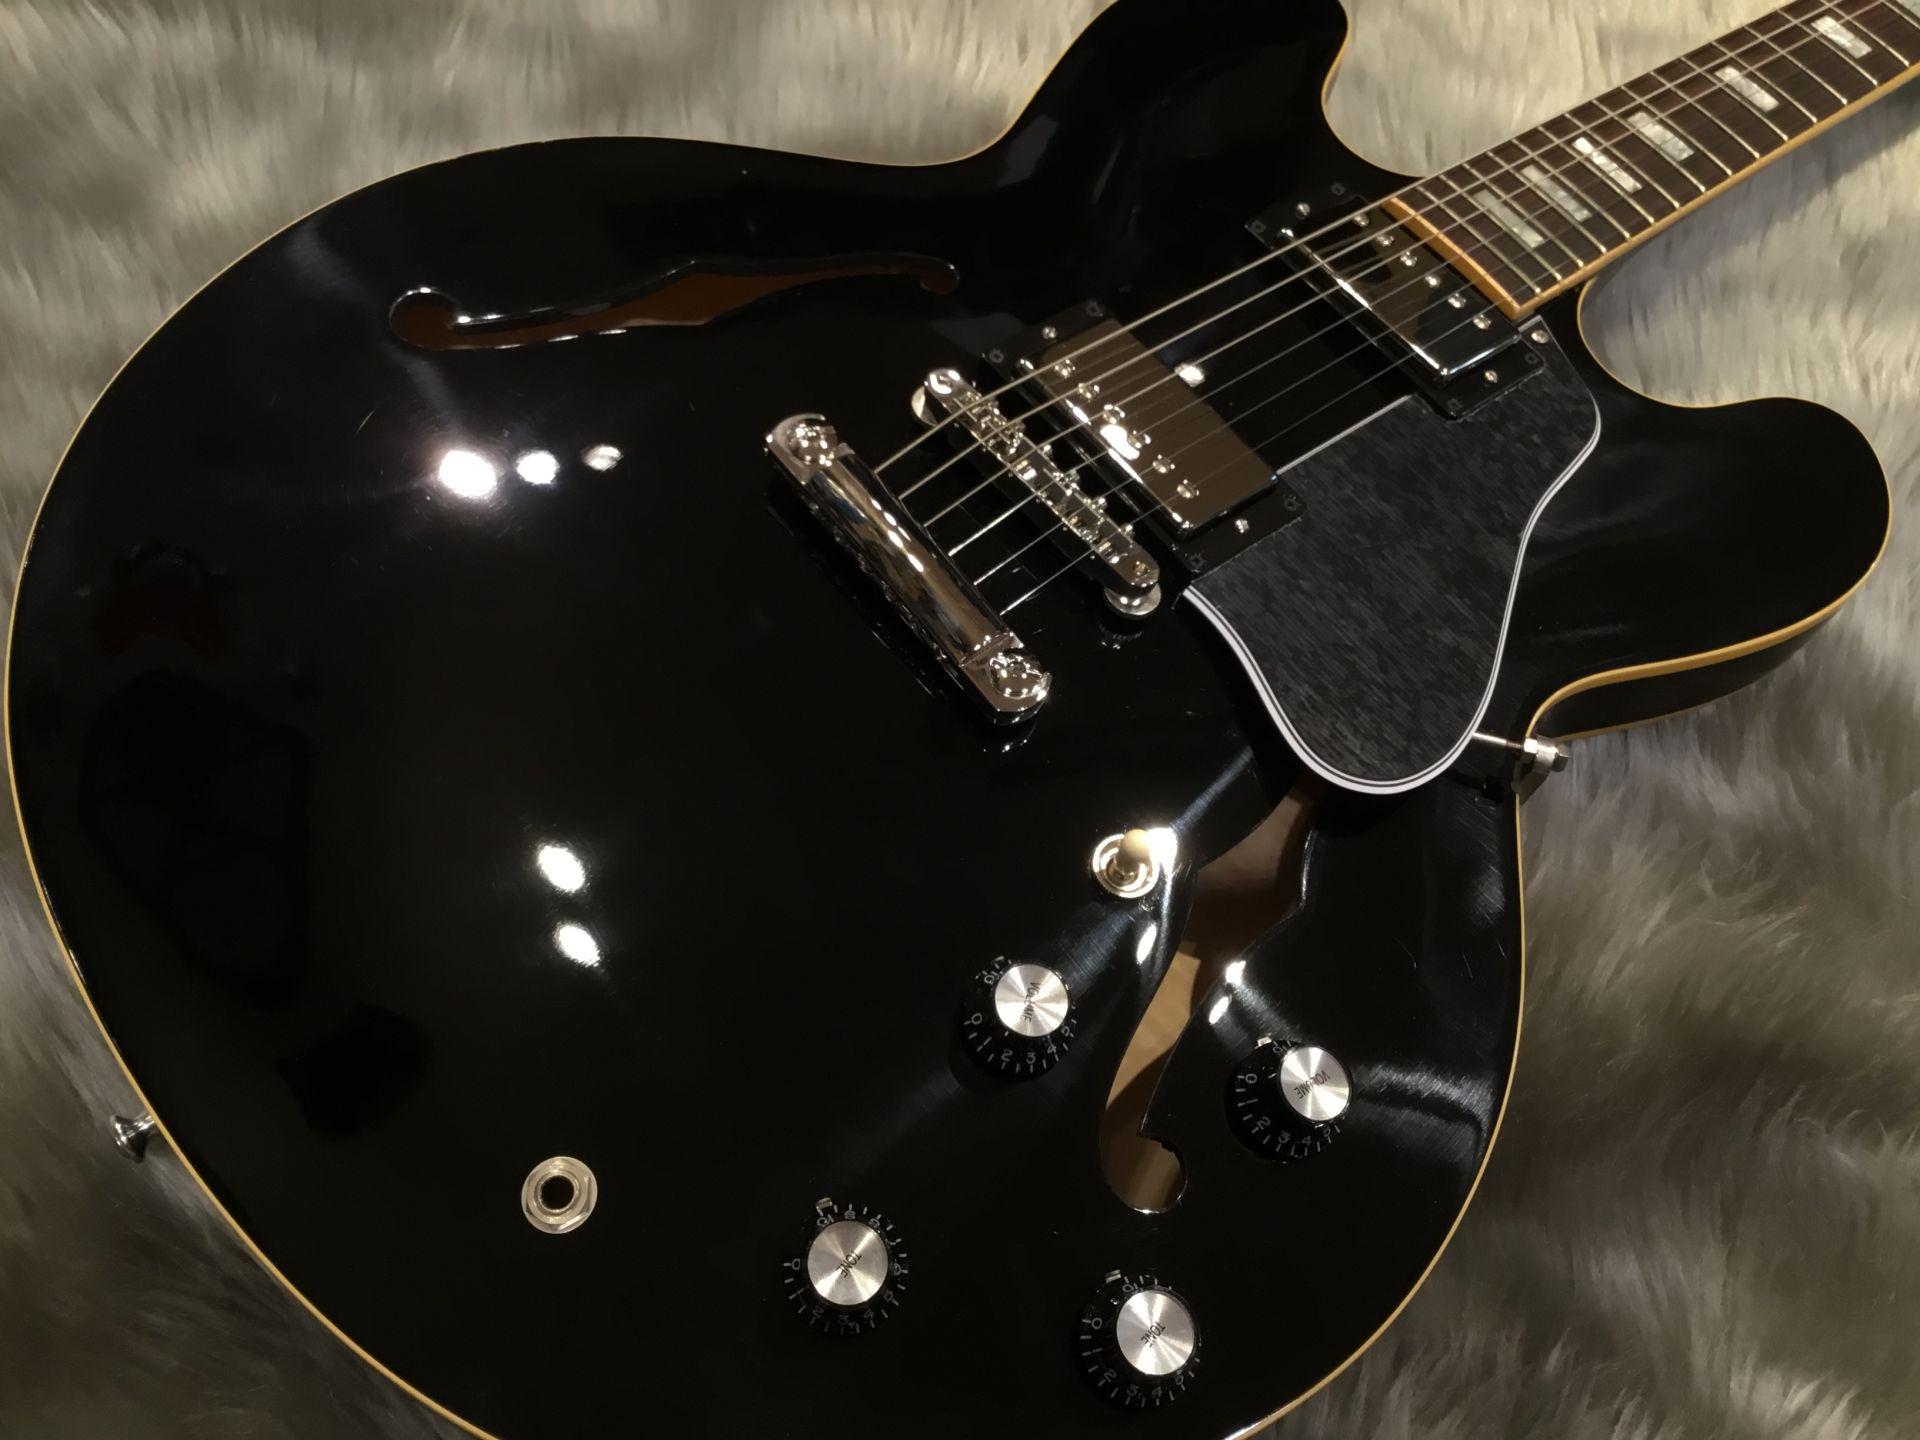 ES-335 TRADITIONALのボディトップ-アップ画像